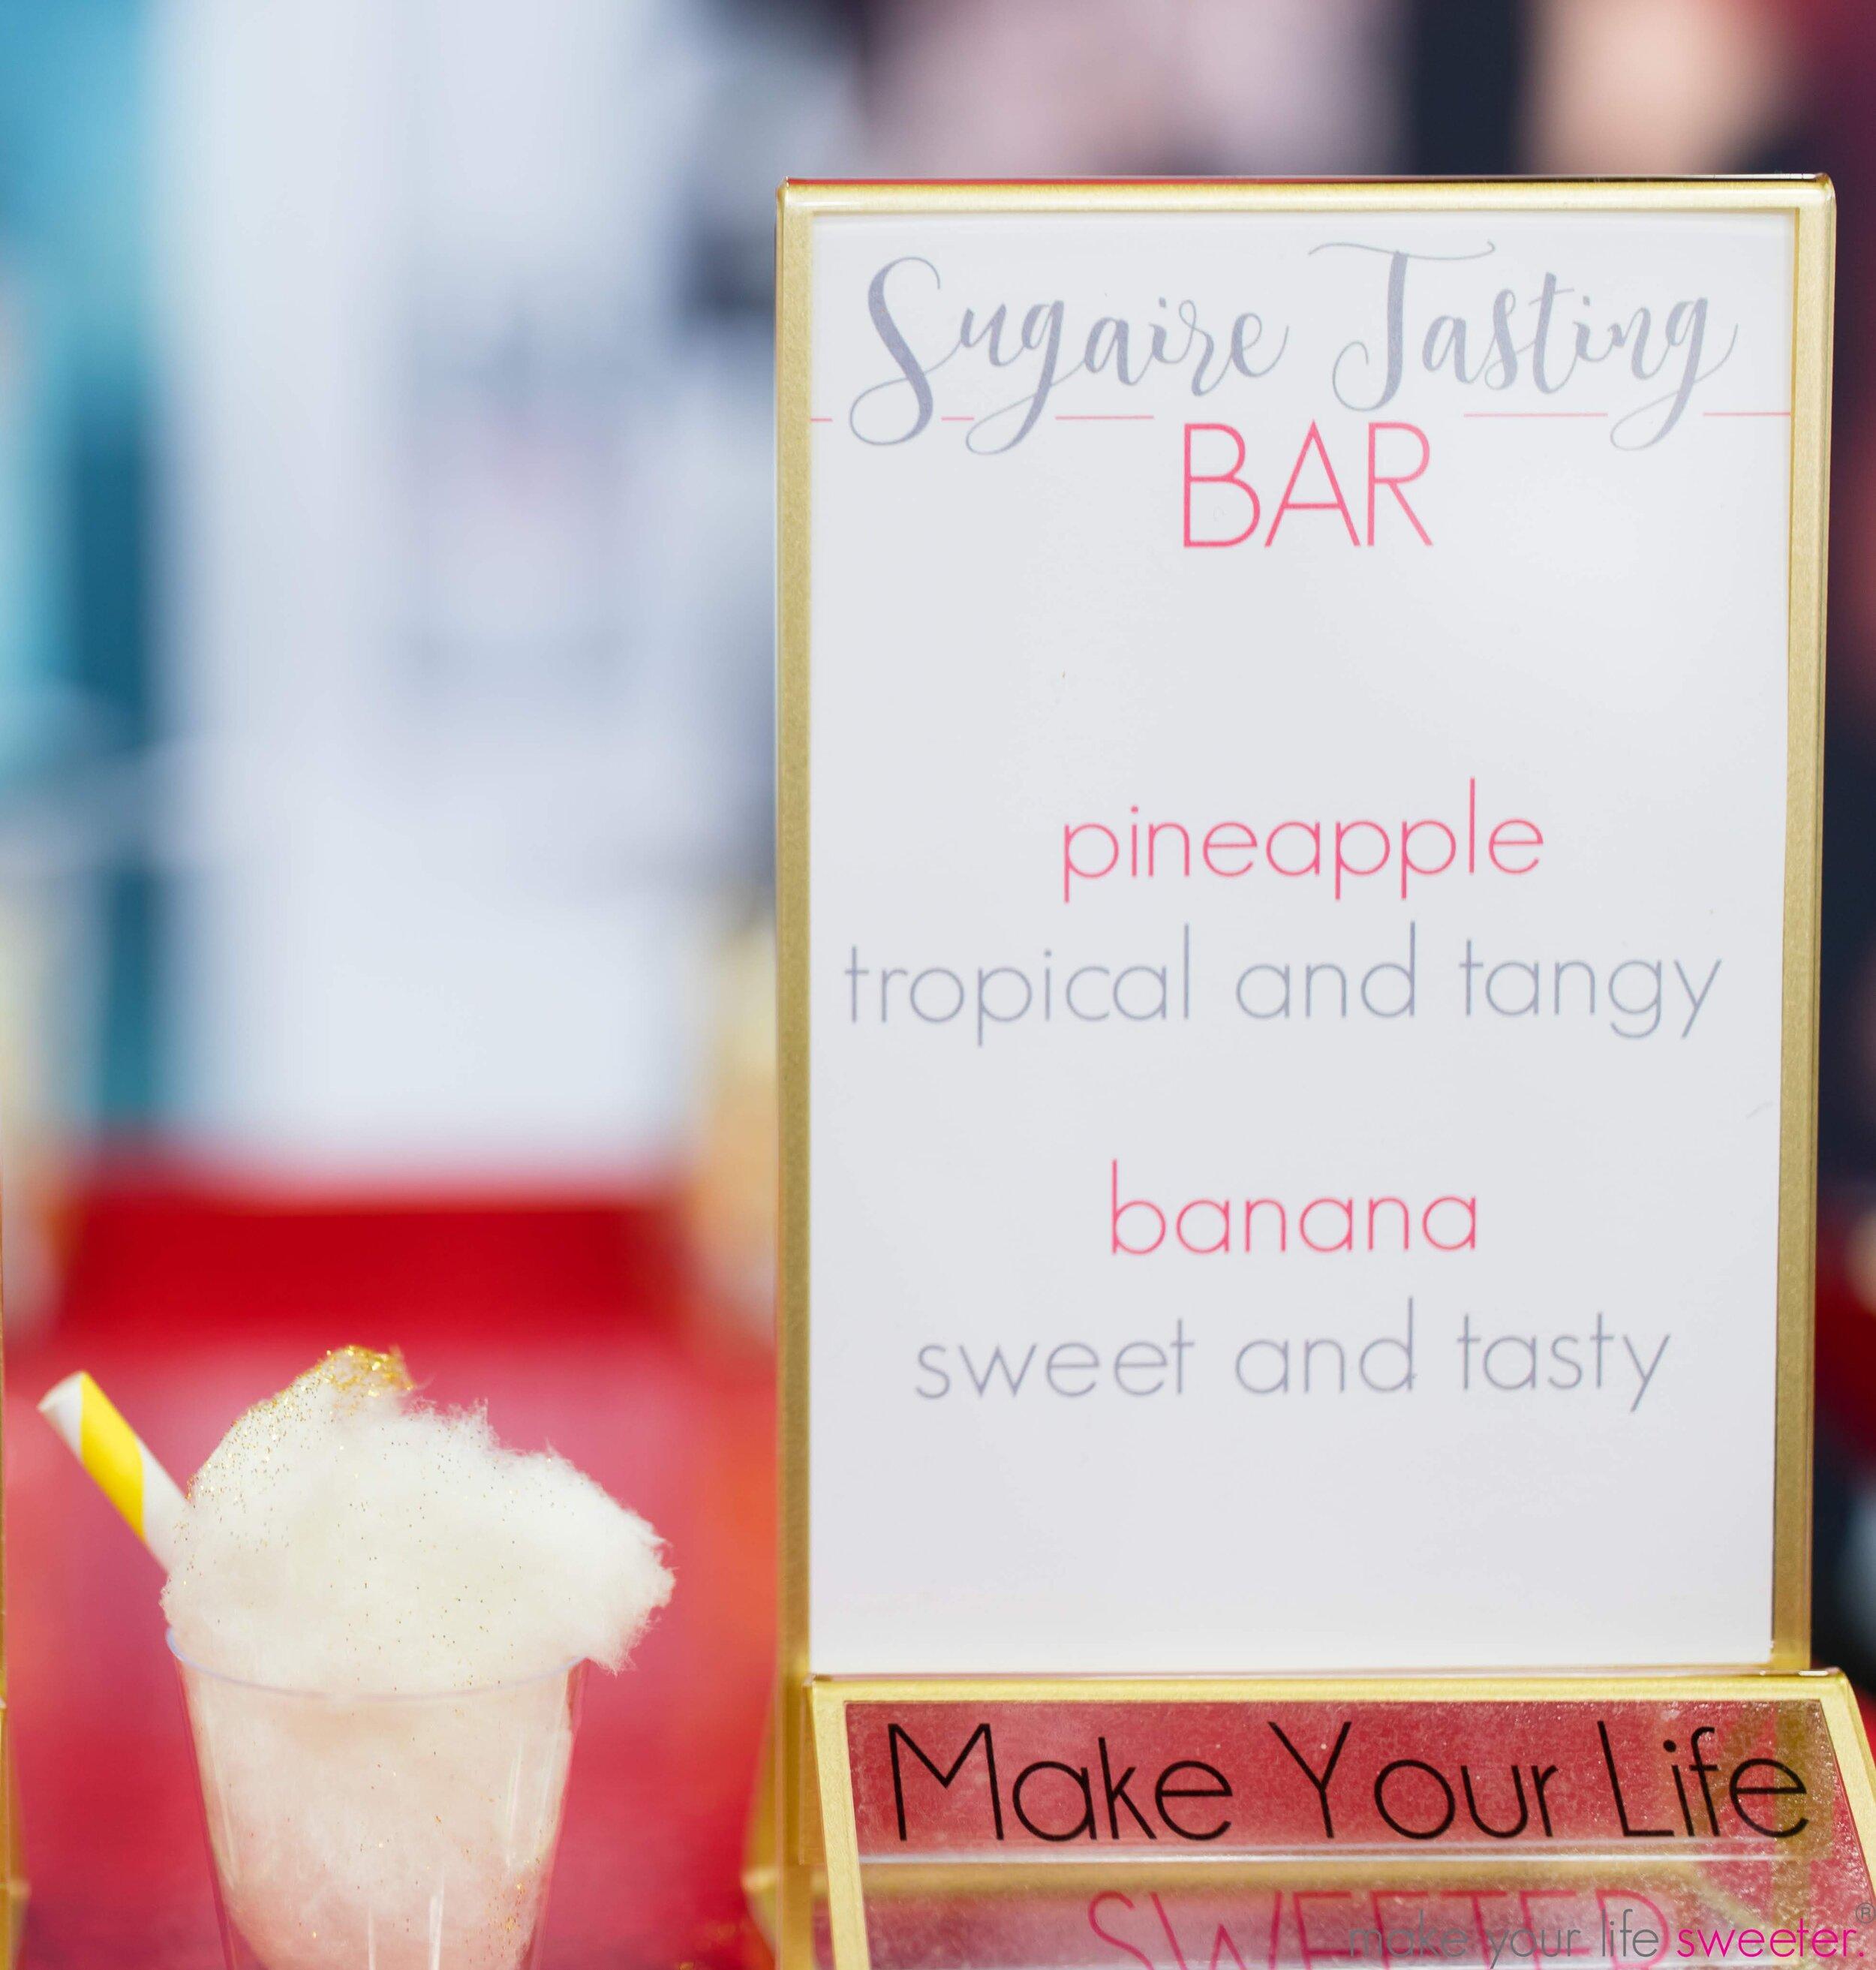 Sugaire Organic Cotton Candy Tasting Bar - Conair Rusk